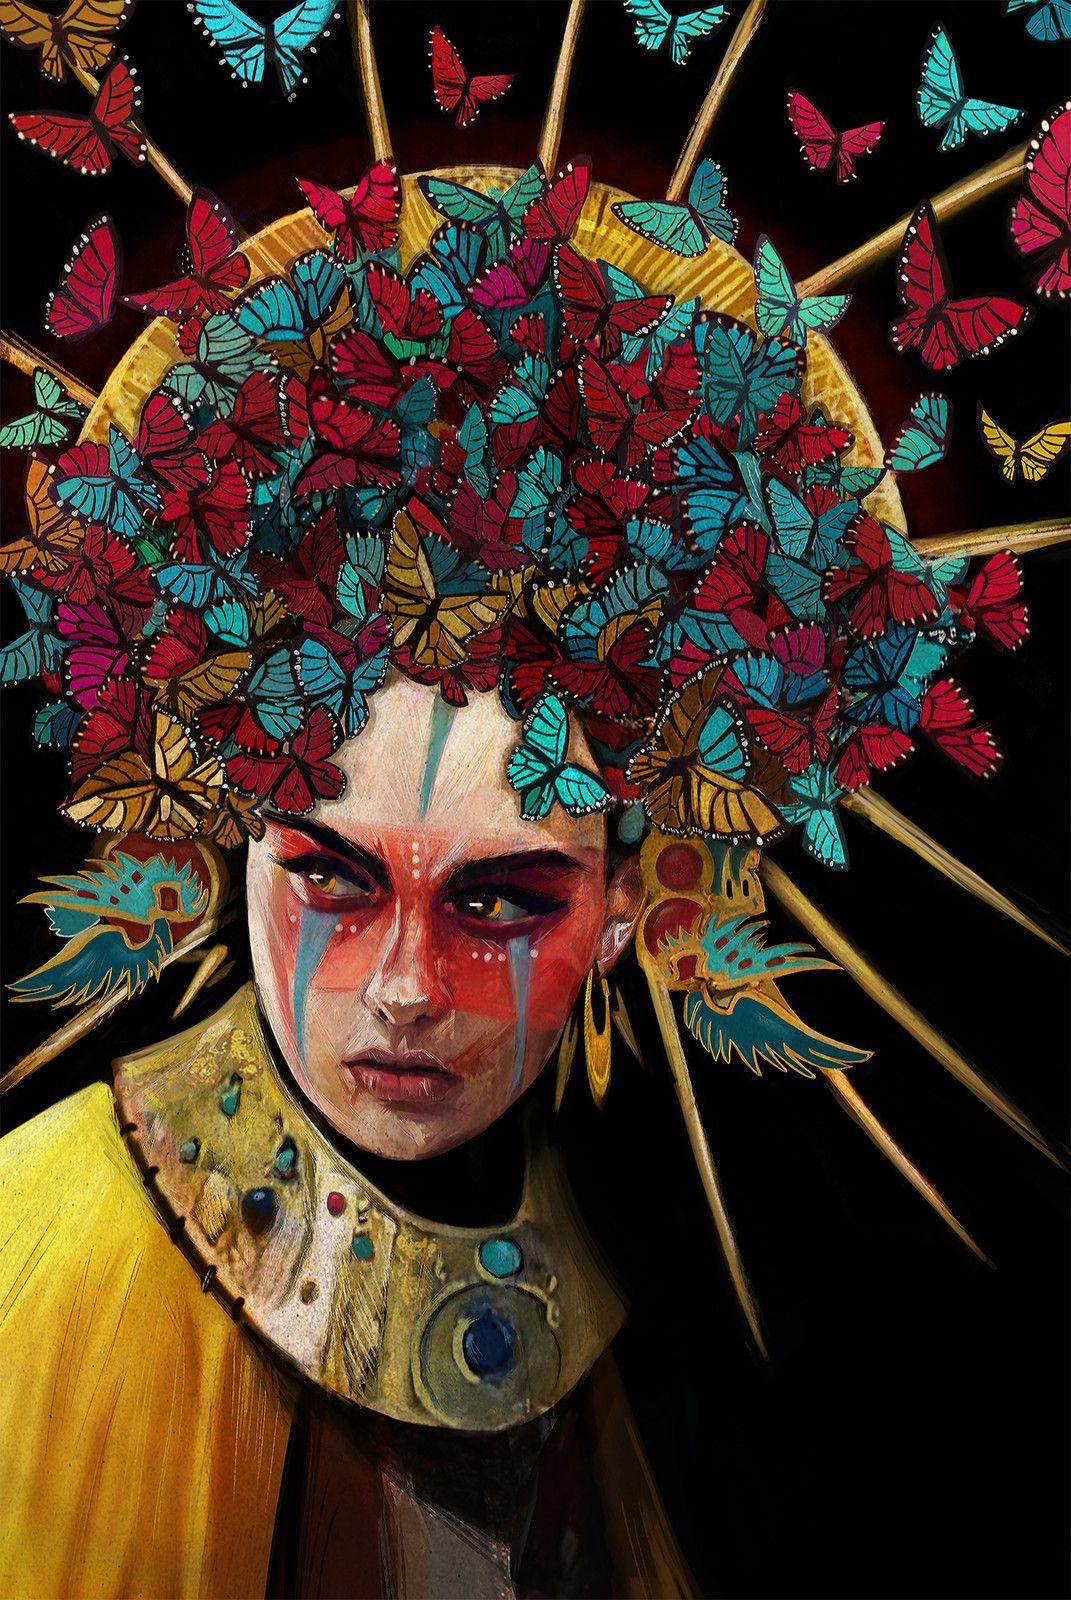 Awana, a Golden Warrior, chloe veillard on ArtStation at https://www.artstation.com/artwork/x656X